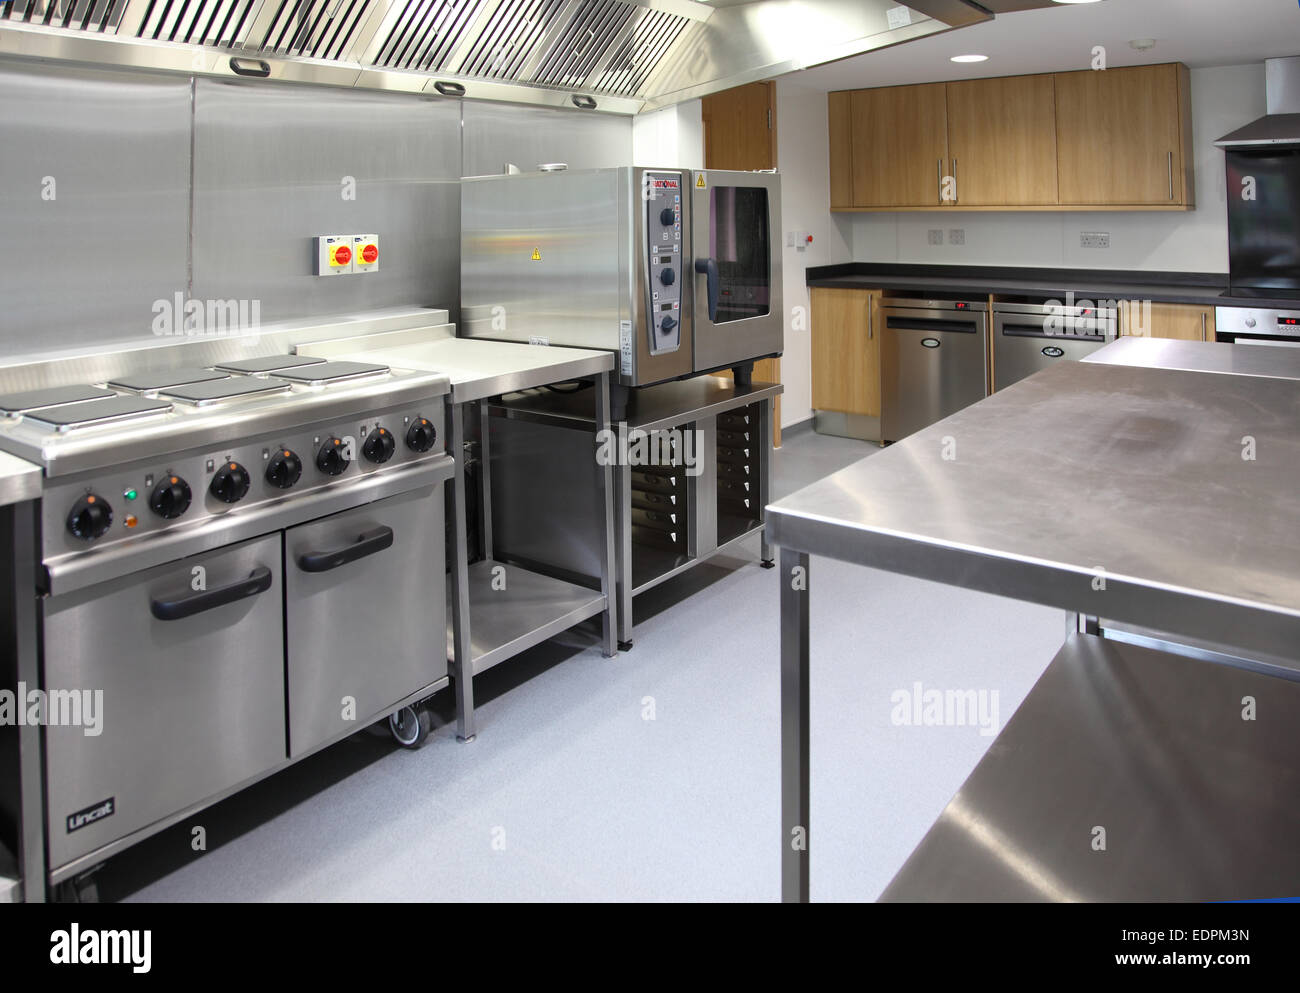 Plate Racks In Kitchen Stockfotos & Plate Racks In Kitchen Bilder ...